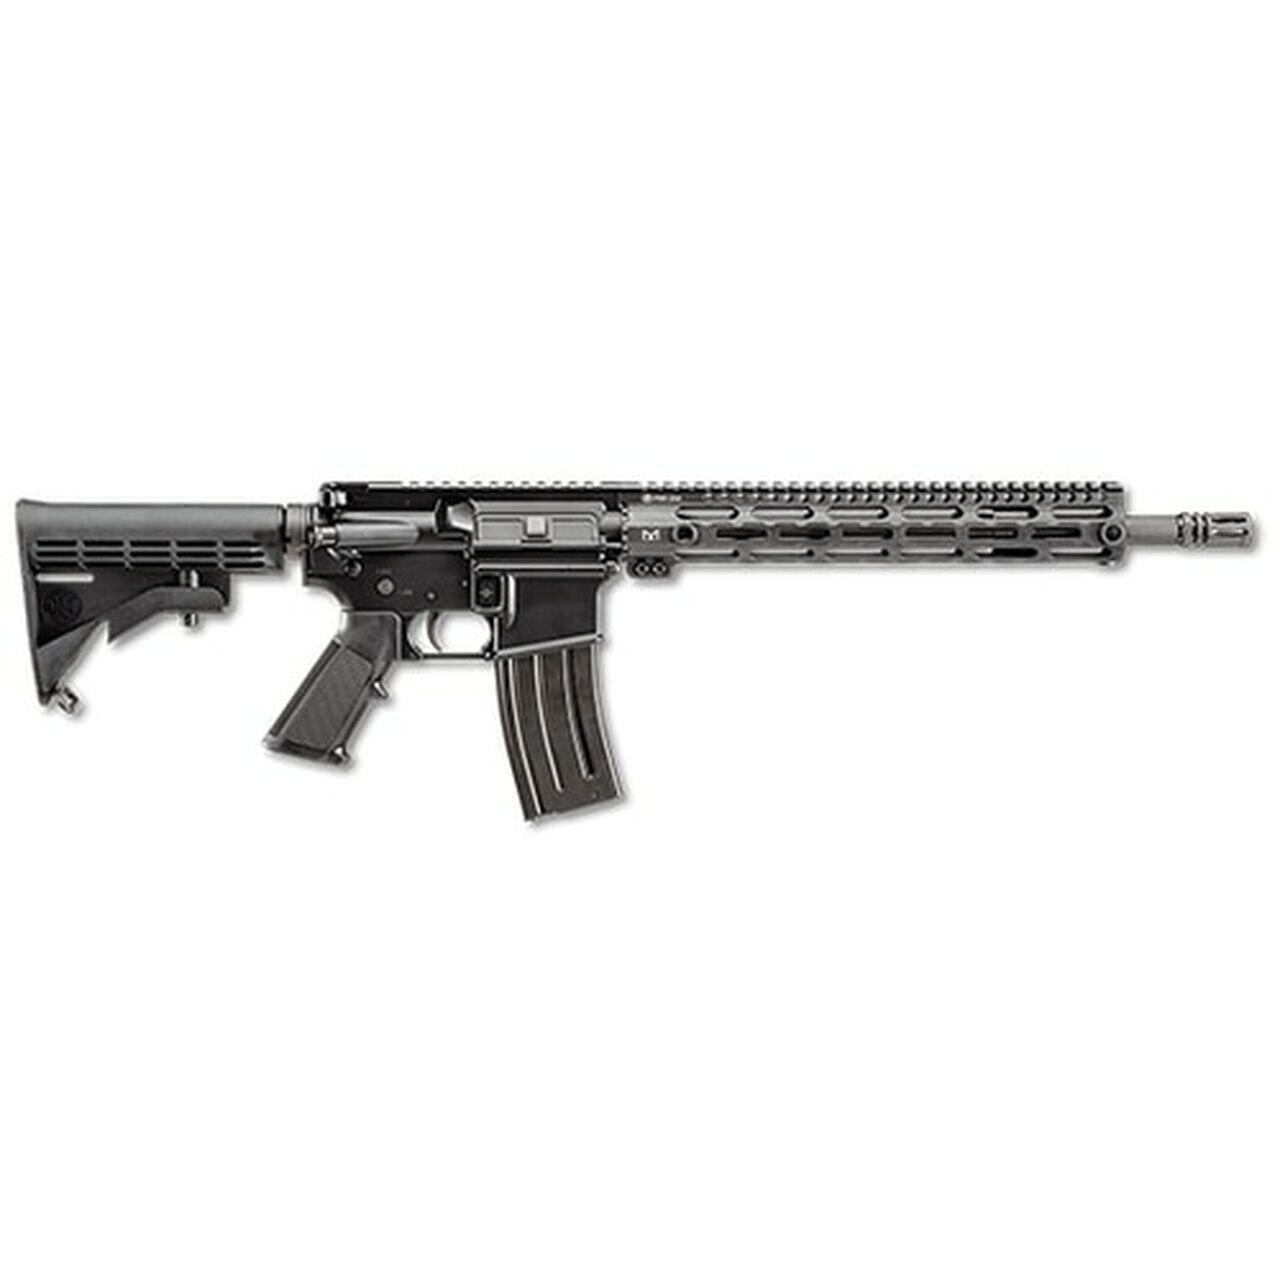 "Image of FN 15 Short Barrelled Rifle Tactical Carbine 5.56mm, 14.5"" Barrel, 30rd NFA Rules Apply, Law Enforcement"